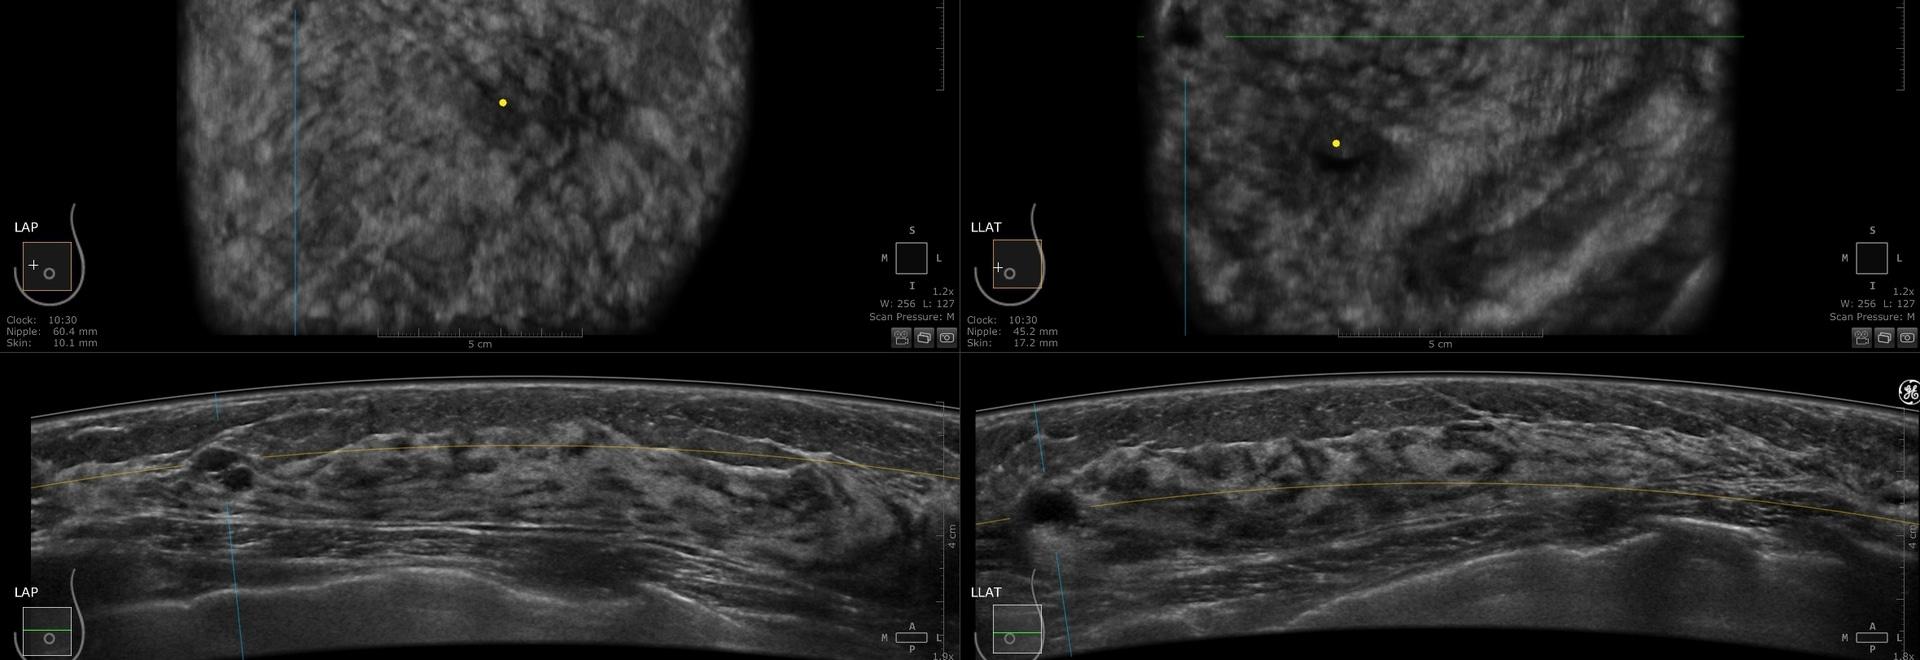 Researcher Investigates Eliminating Radiation for HER2-Positive Breast Cancer